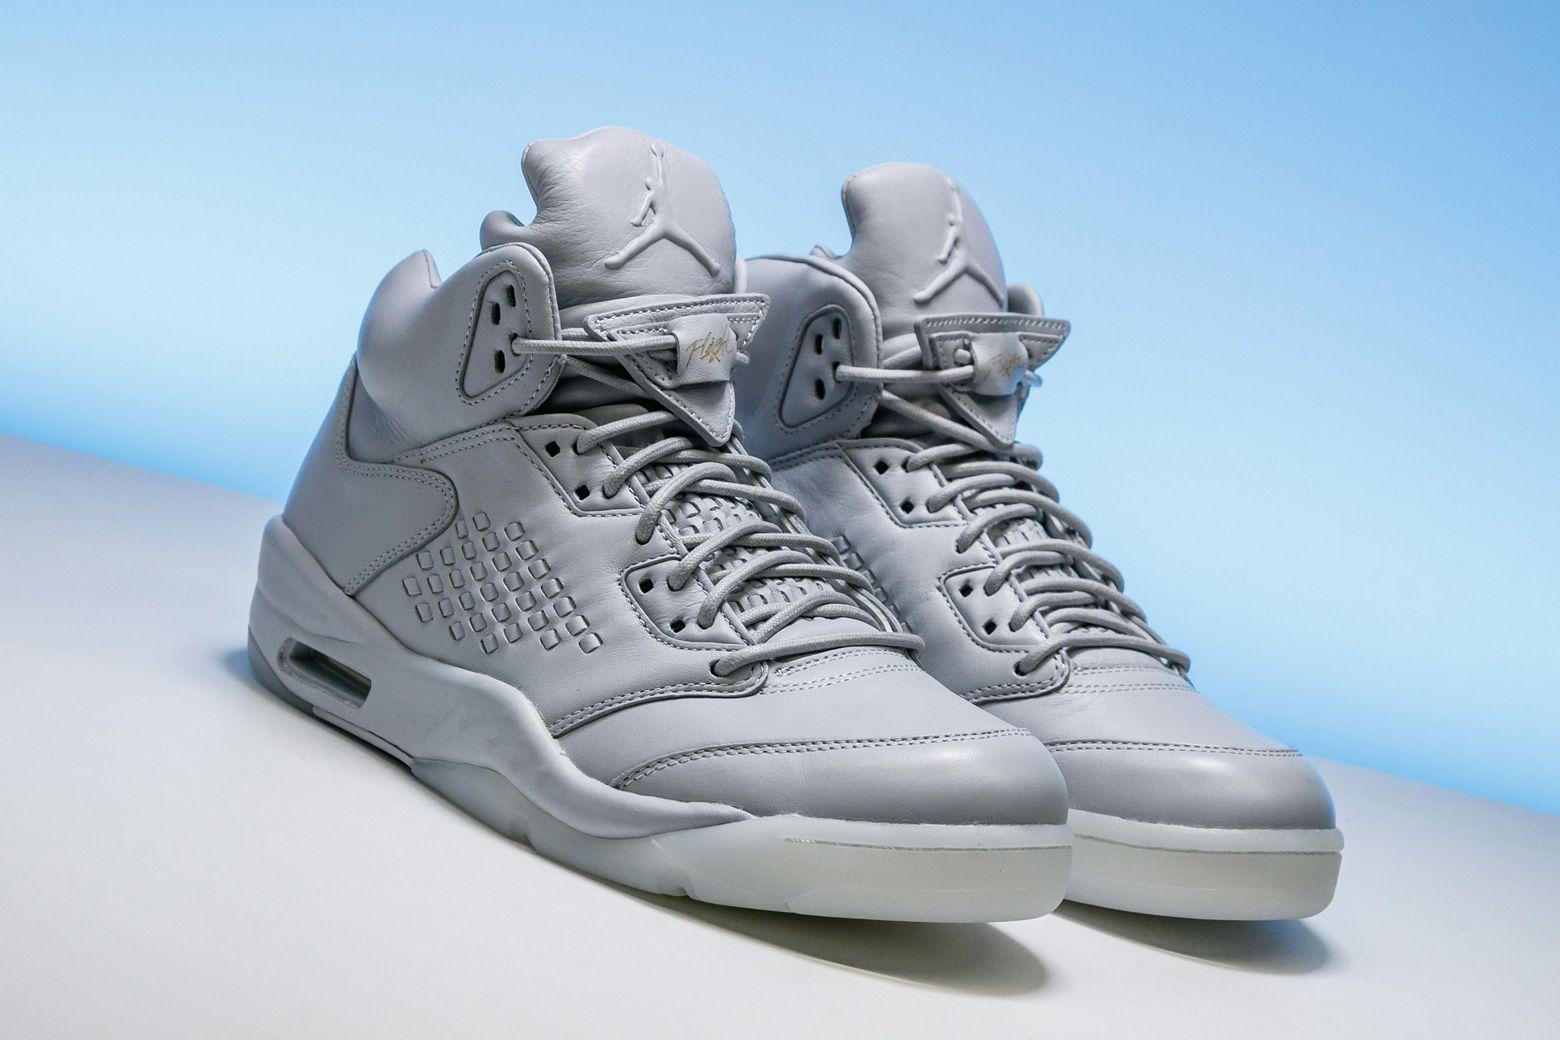 1eeb8ff424e2 The luxurious Air Jordan 5 Premium is a clean summer shoe (especially when  most sizes are below retail).